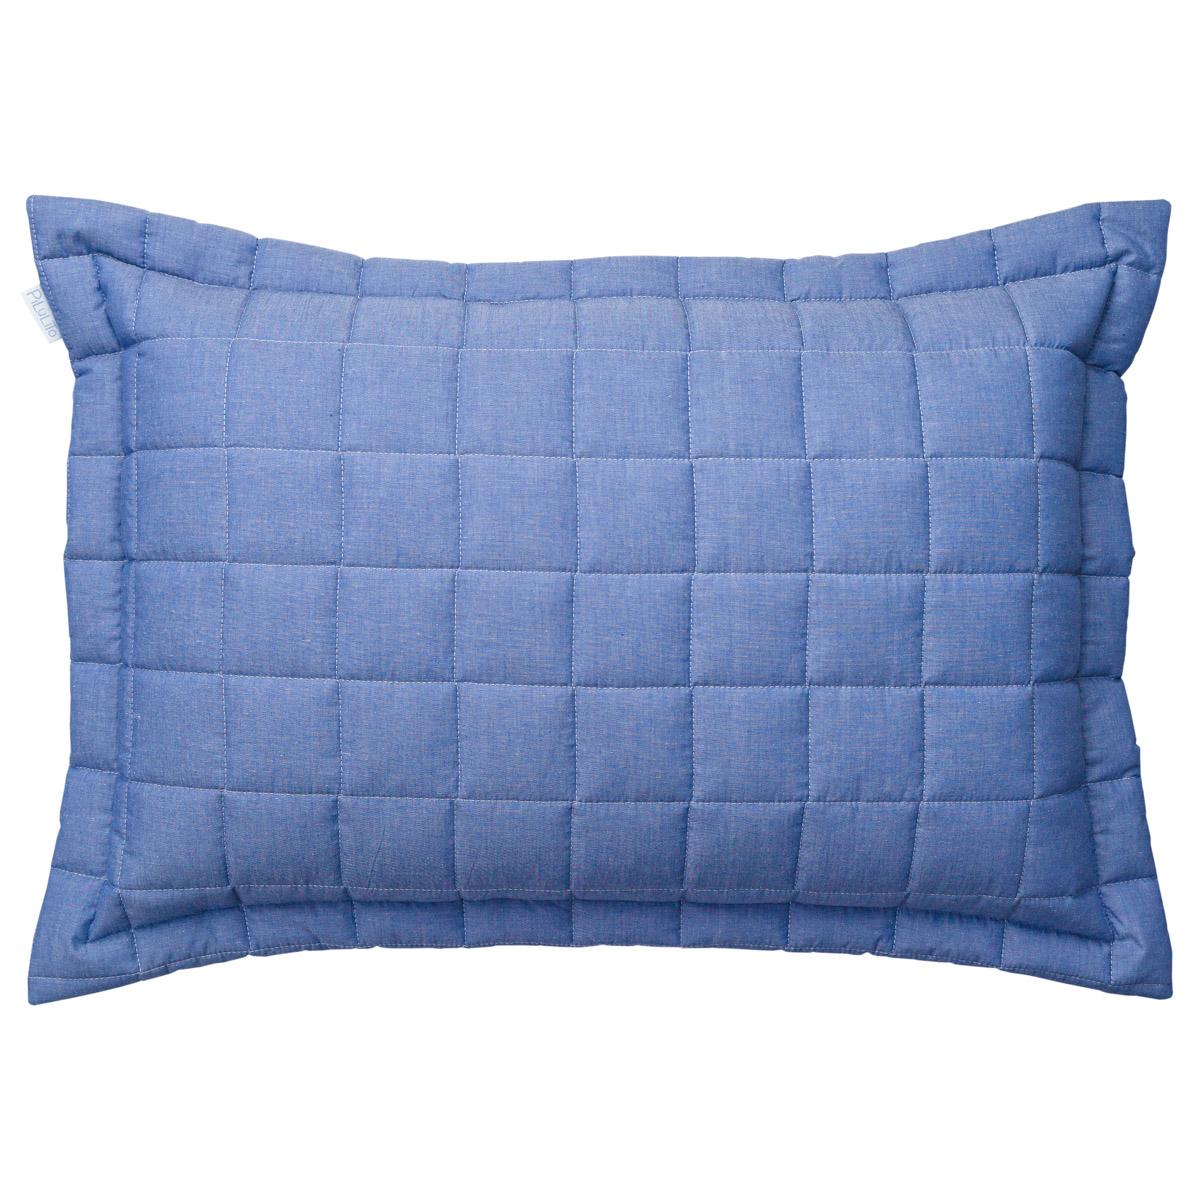 Porta Travesseiro Chambray Azul Jeans